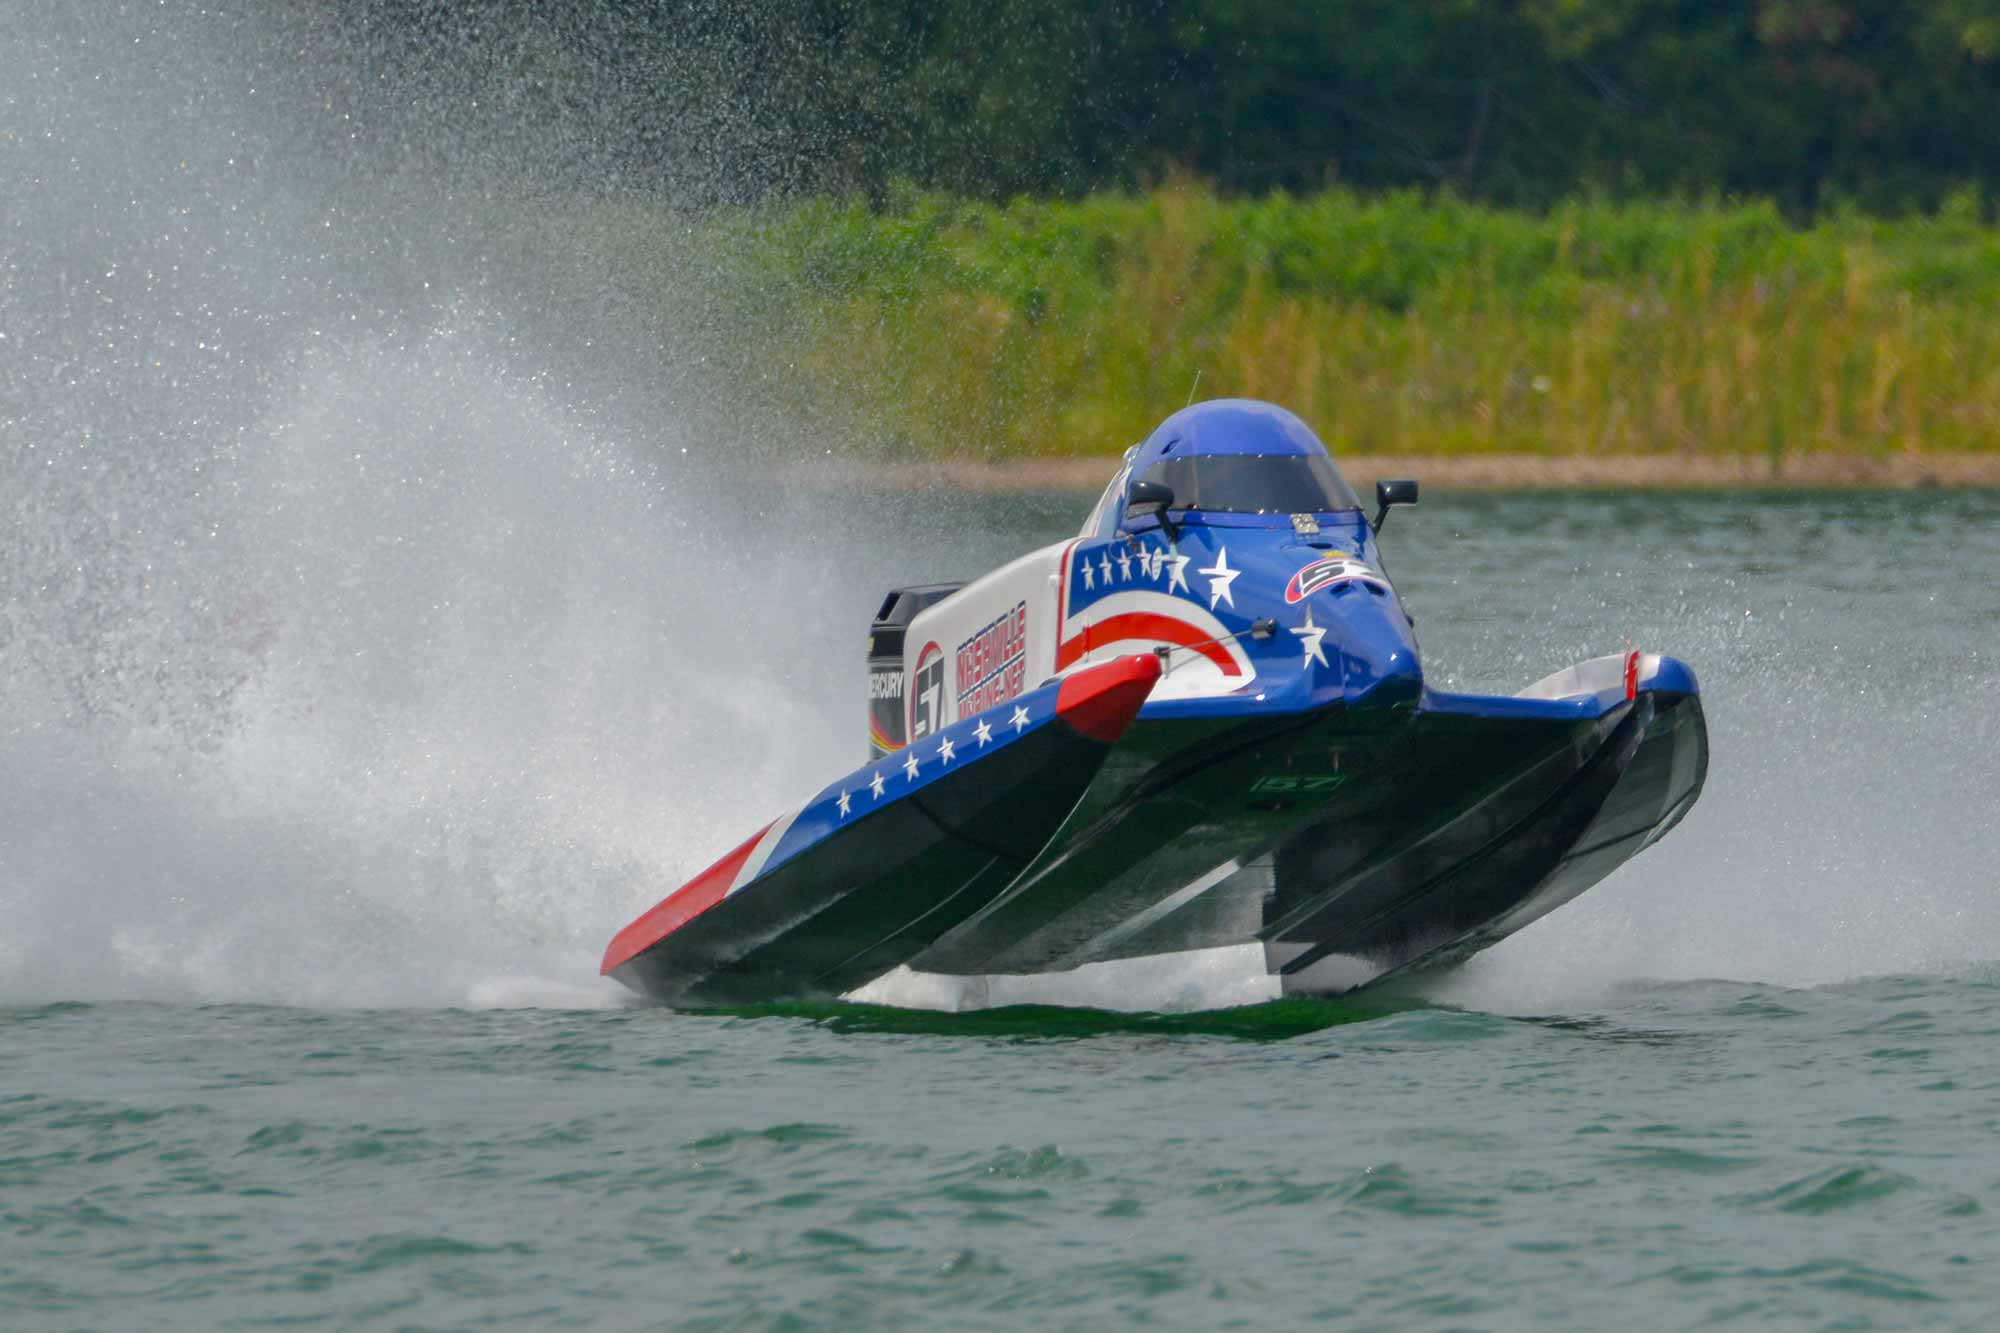 McMurray-Racing-Nashvill-Marine-2021-Springfield-F1-Race-18